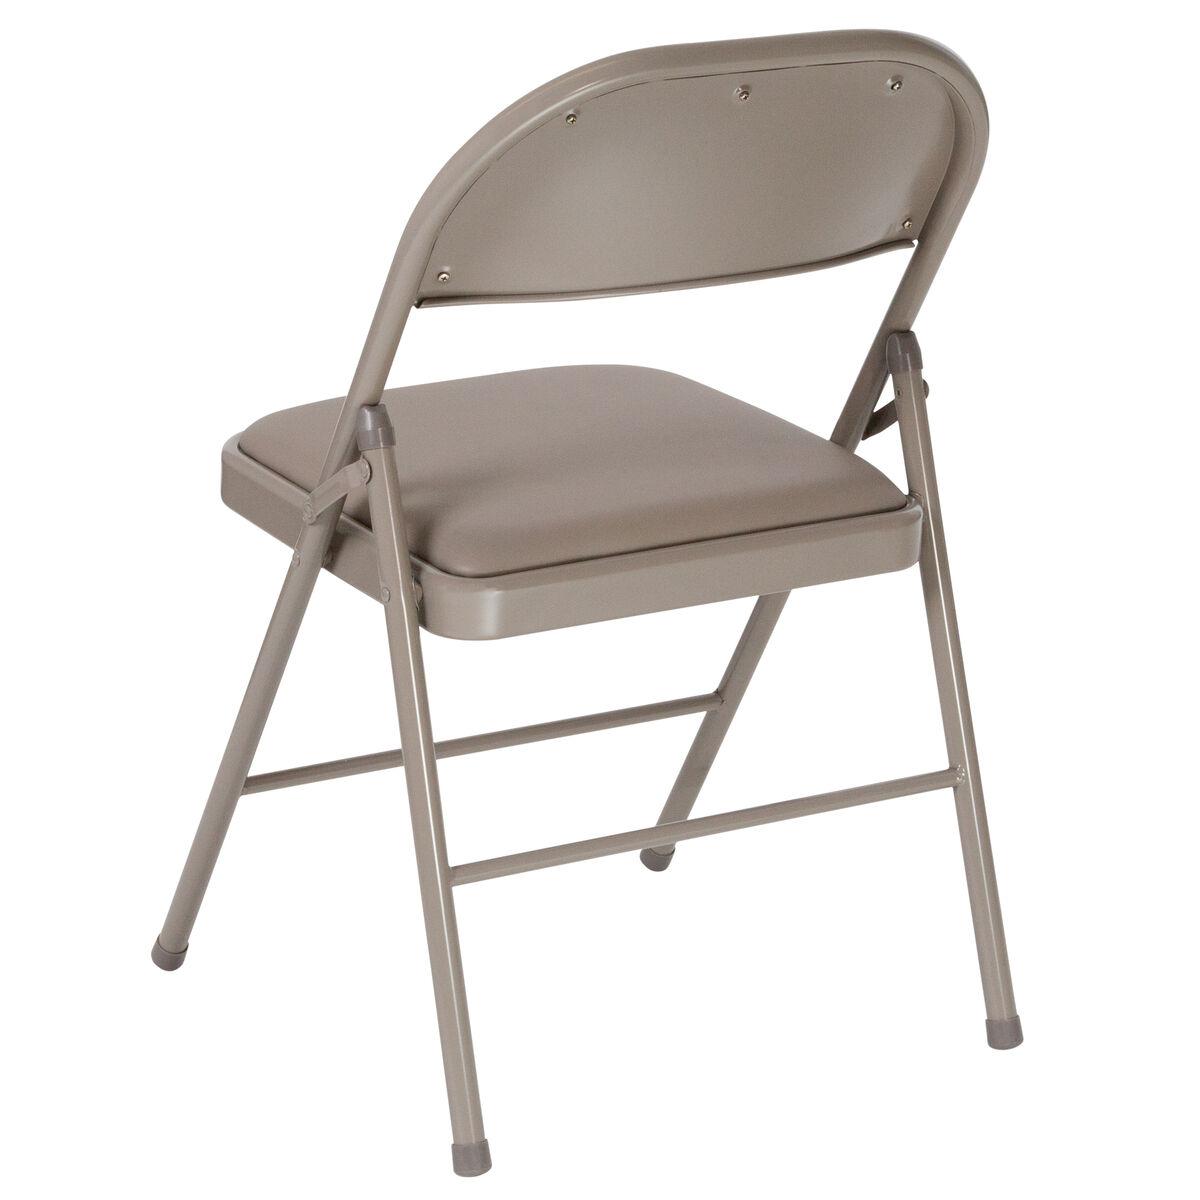 vinyl folding chairs. Vinyl Folding Chairs L